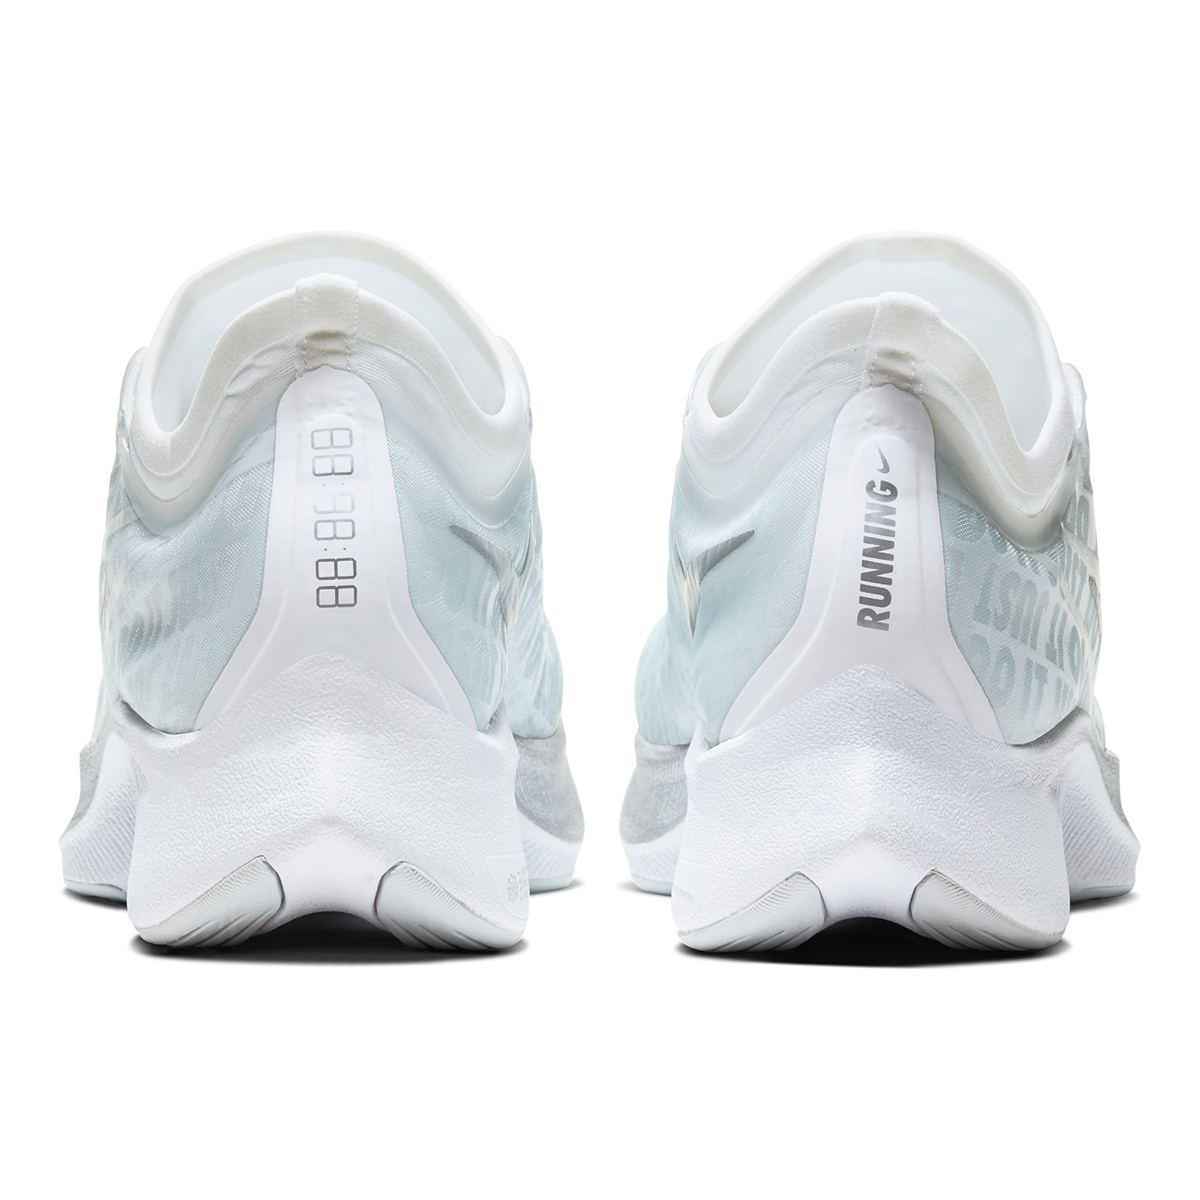 Women's Nike Zoom Fly 3 Running Shoe - Color: Pure Platinum/White/Aura/Metallic Silver (Regular Width) - Size: 5, Pure Platinum/White/Aura/Metallic Silver, large, image 3